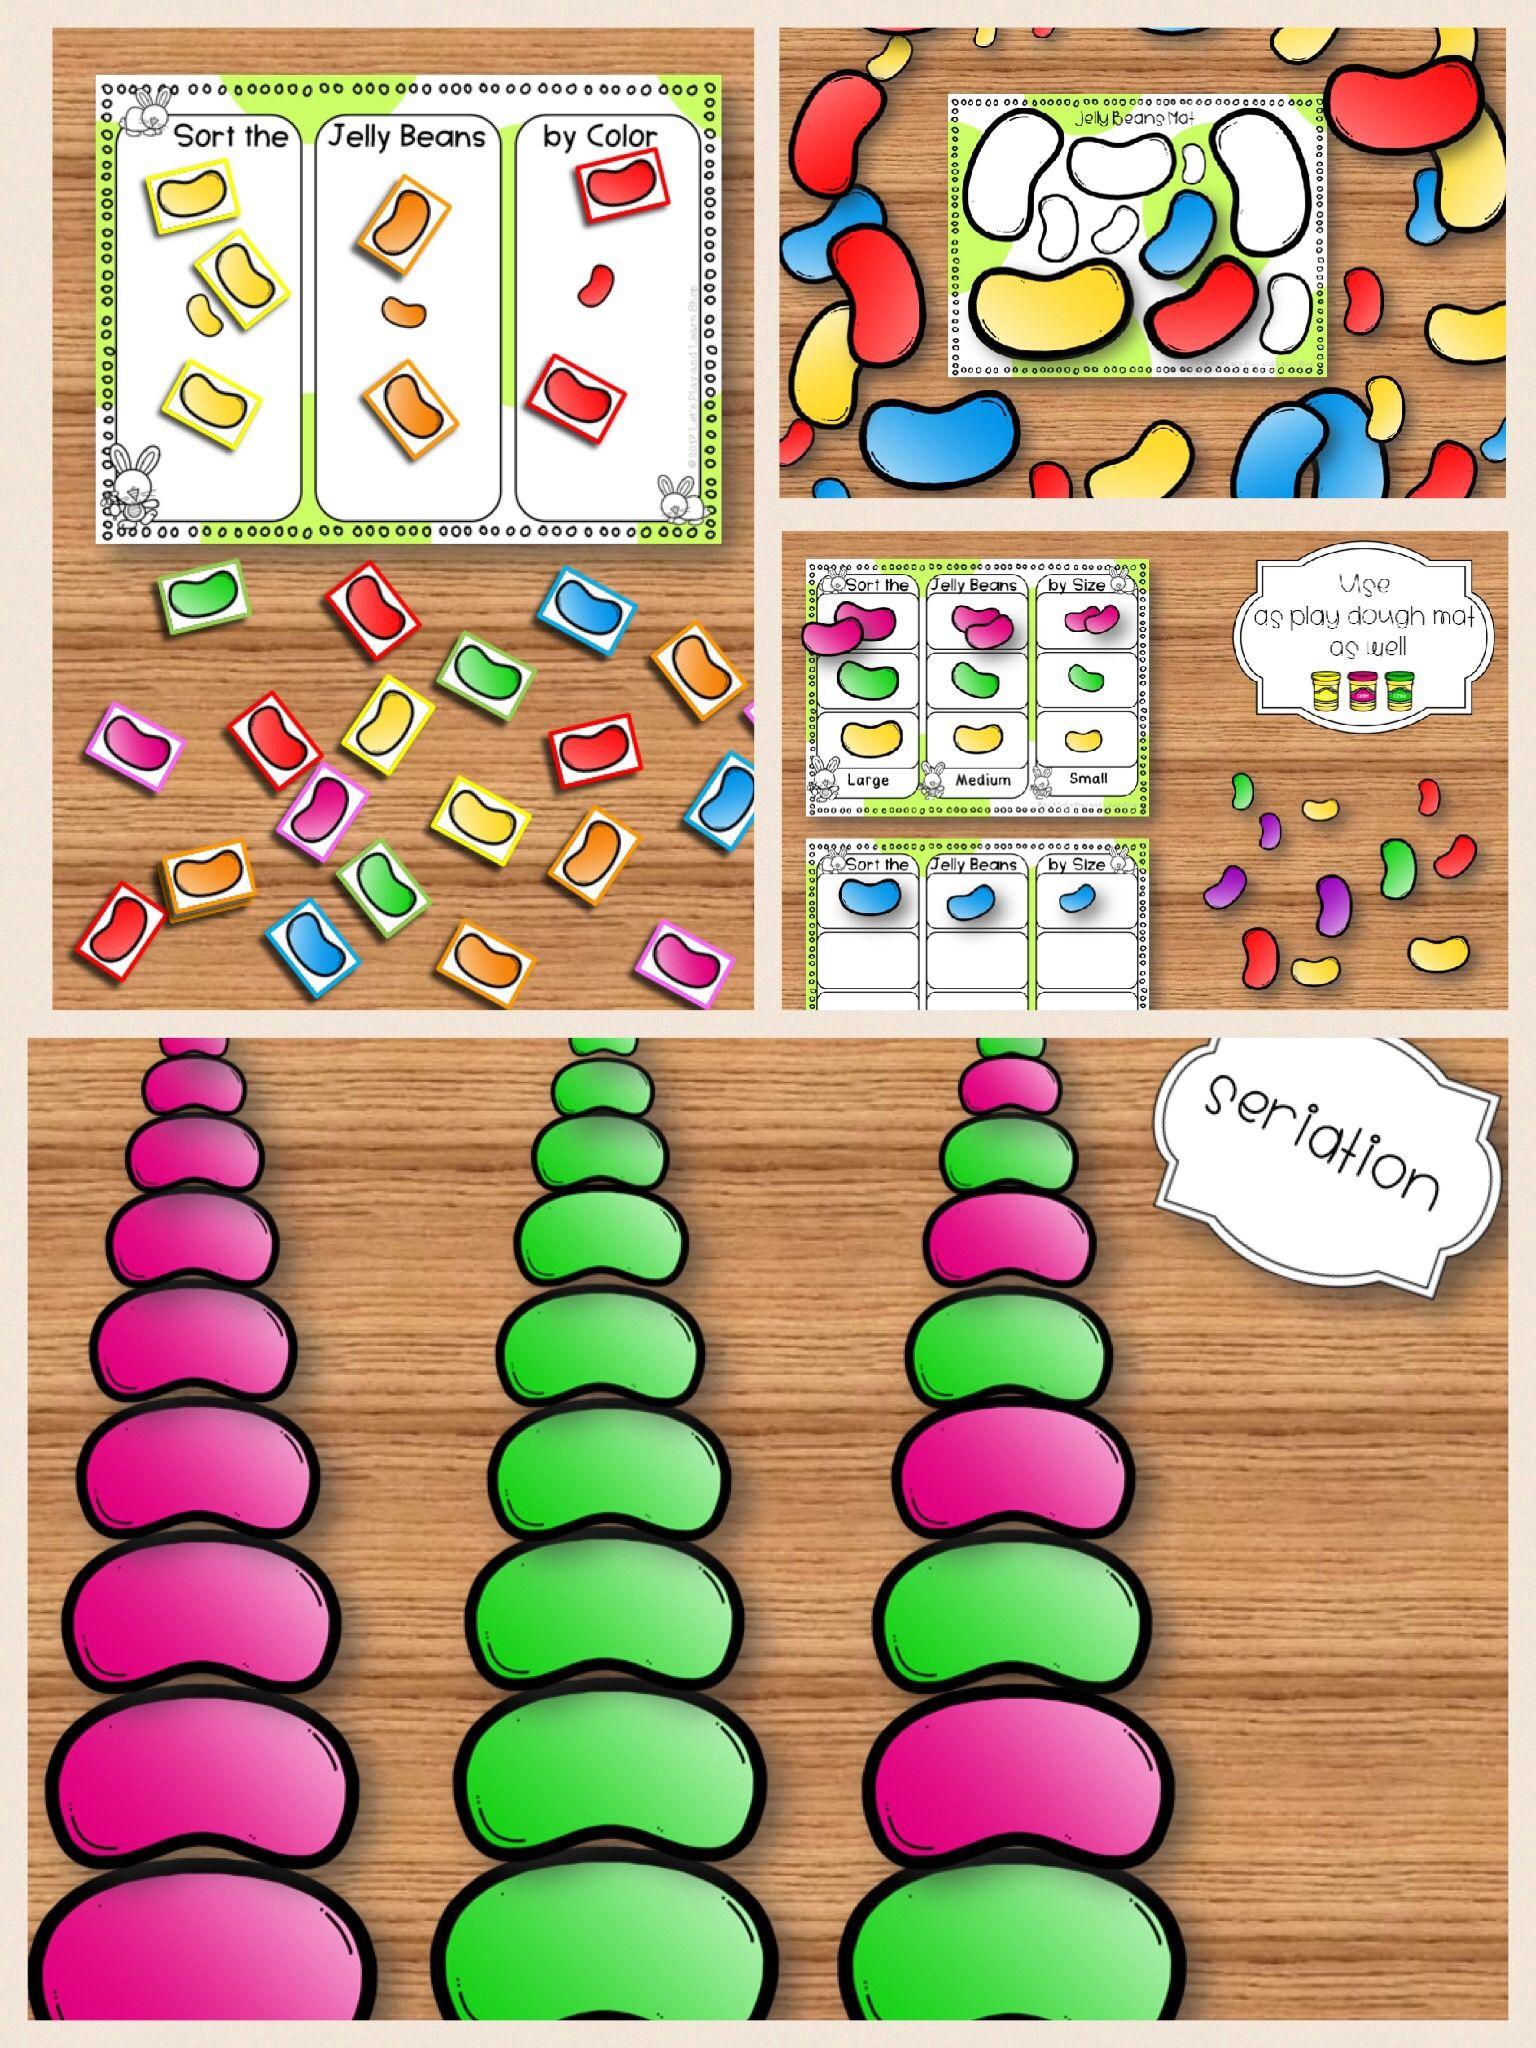 Jelly Beans Play Dough Mats Pre Math Amp Math Toddlers